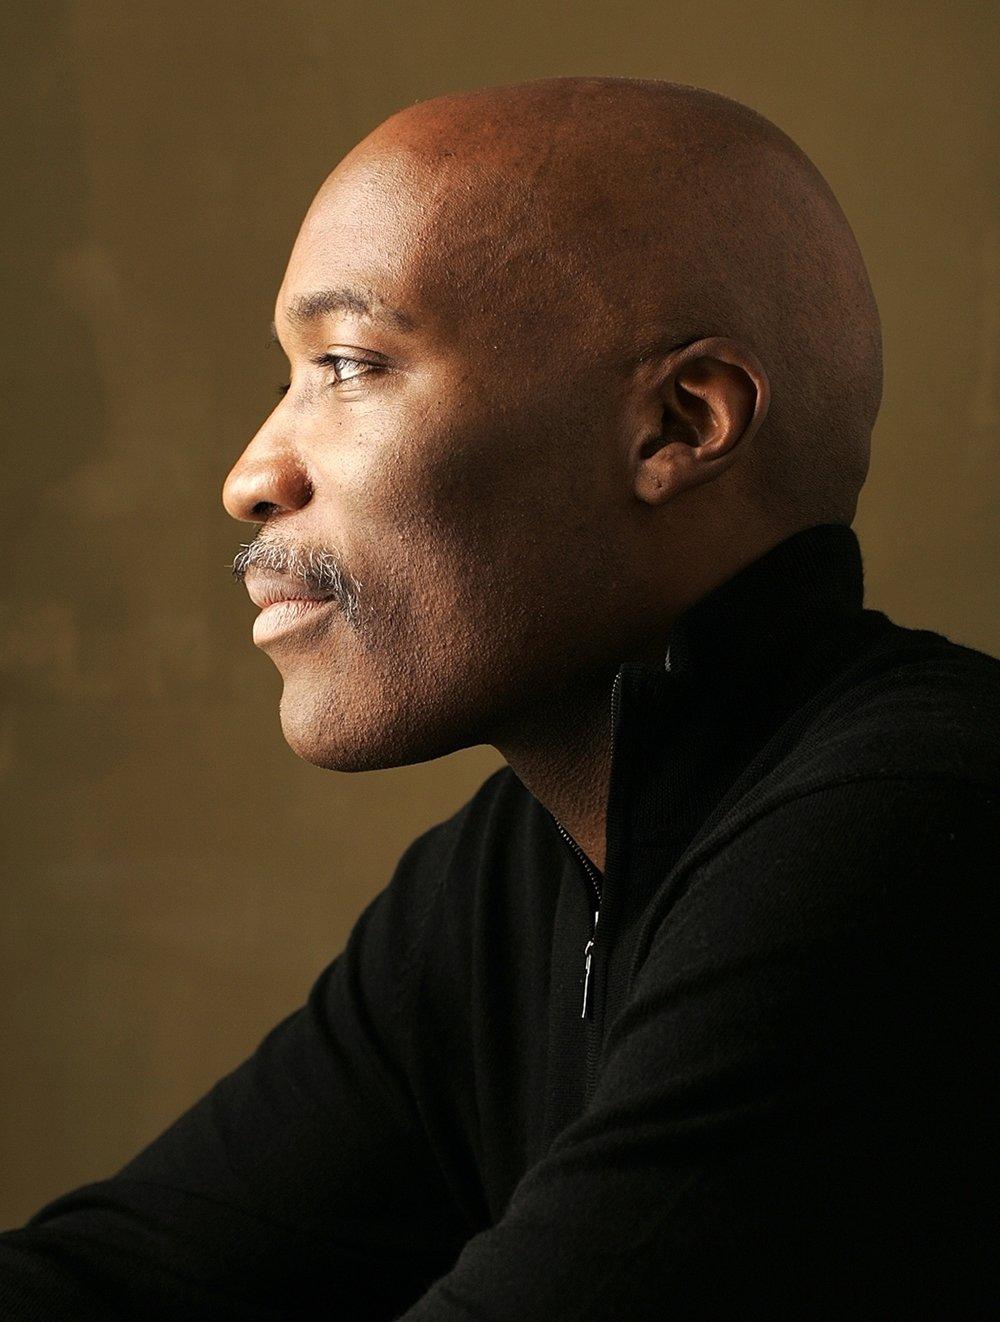 Composer Darrell Grant. Image by Hiroshi Iwaya.